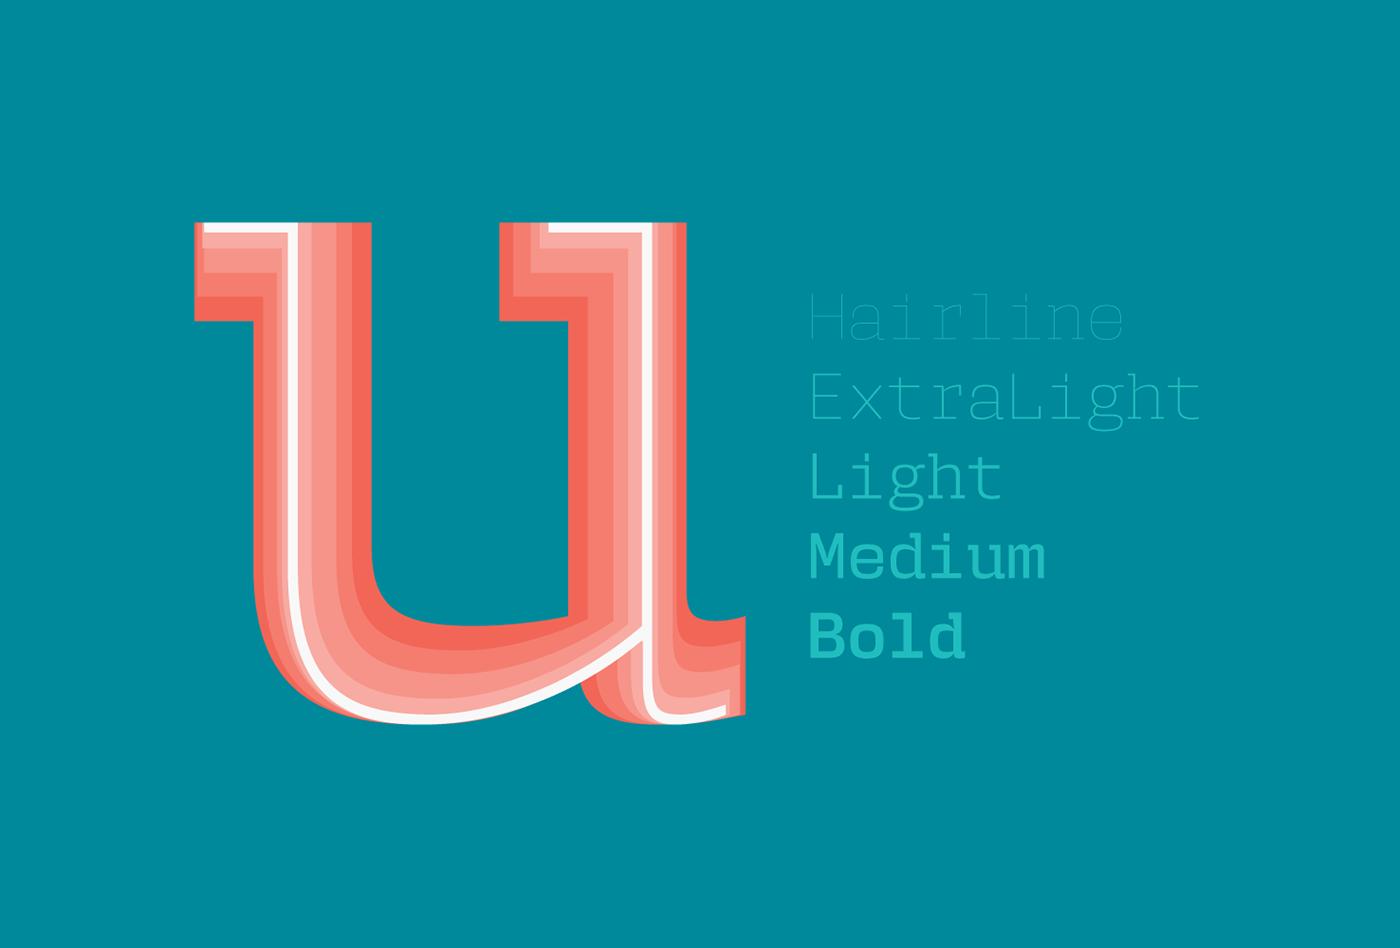 monospaced Typeface font user Pedro Leal DSType